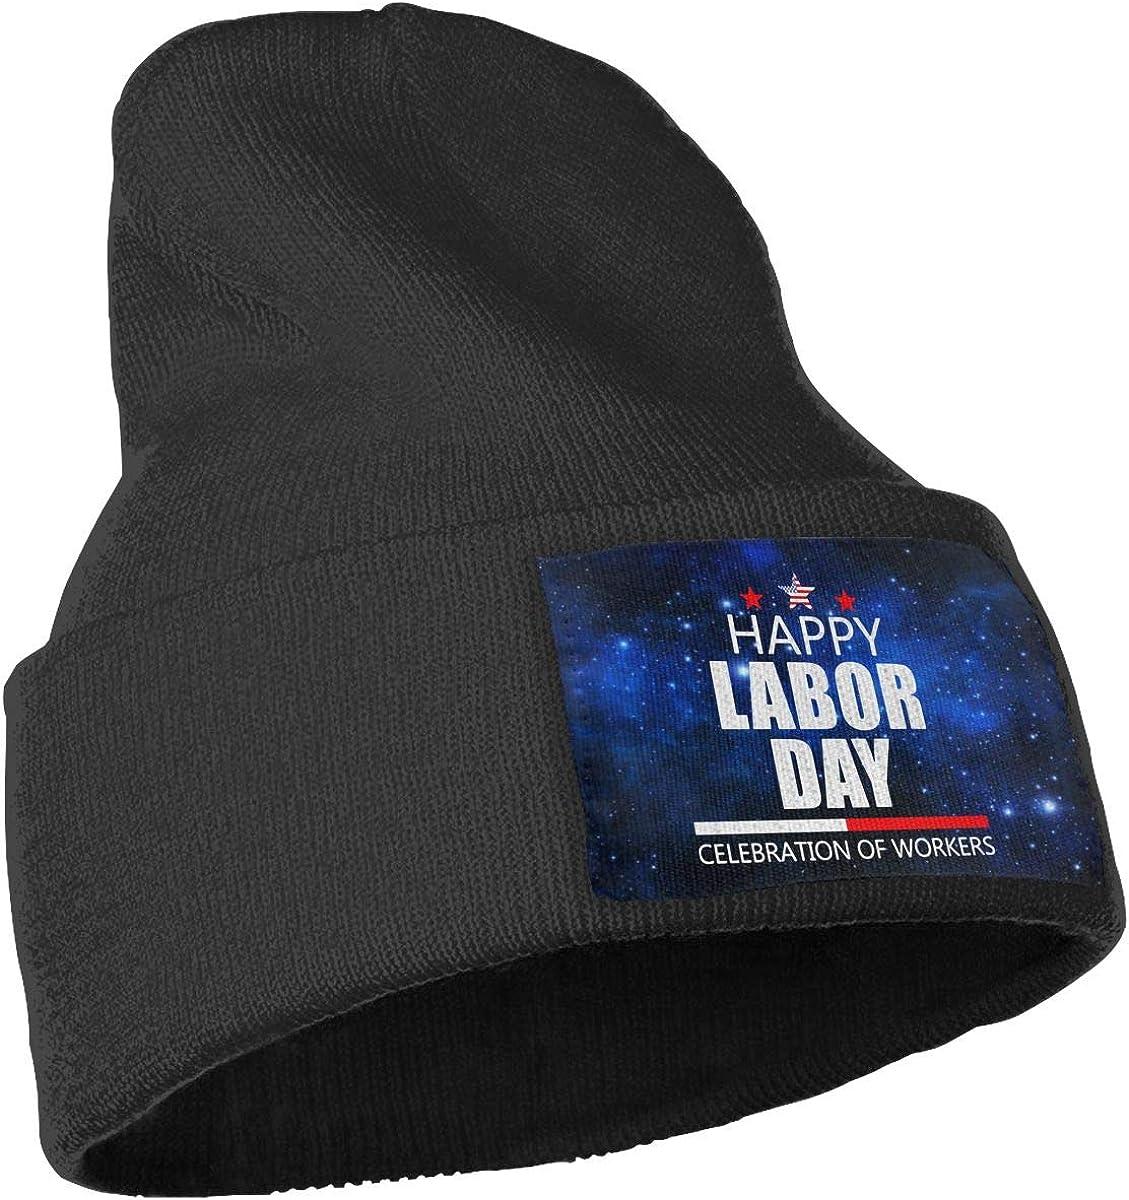 COLLJL-8 Men /& Women Celebrate Labor Day Outdoor Warm Knit Beanies Hat Soft Winter Knit Caps